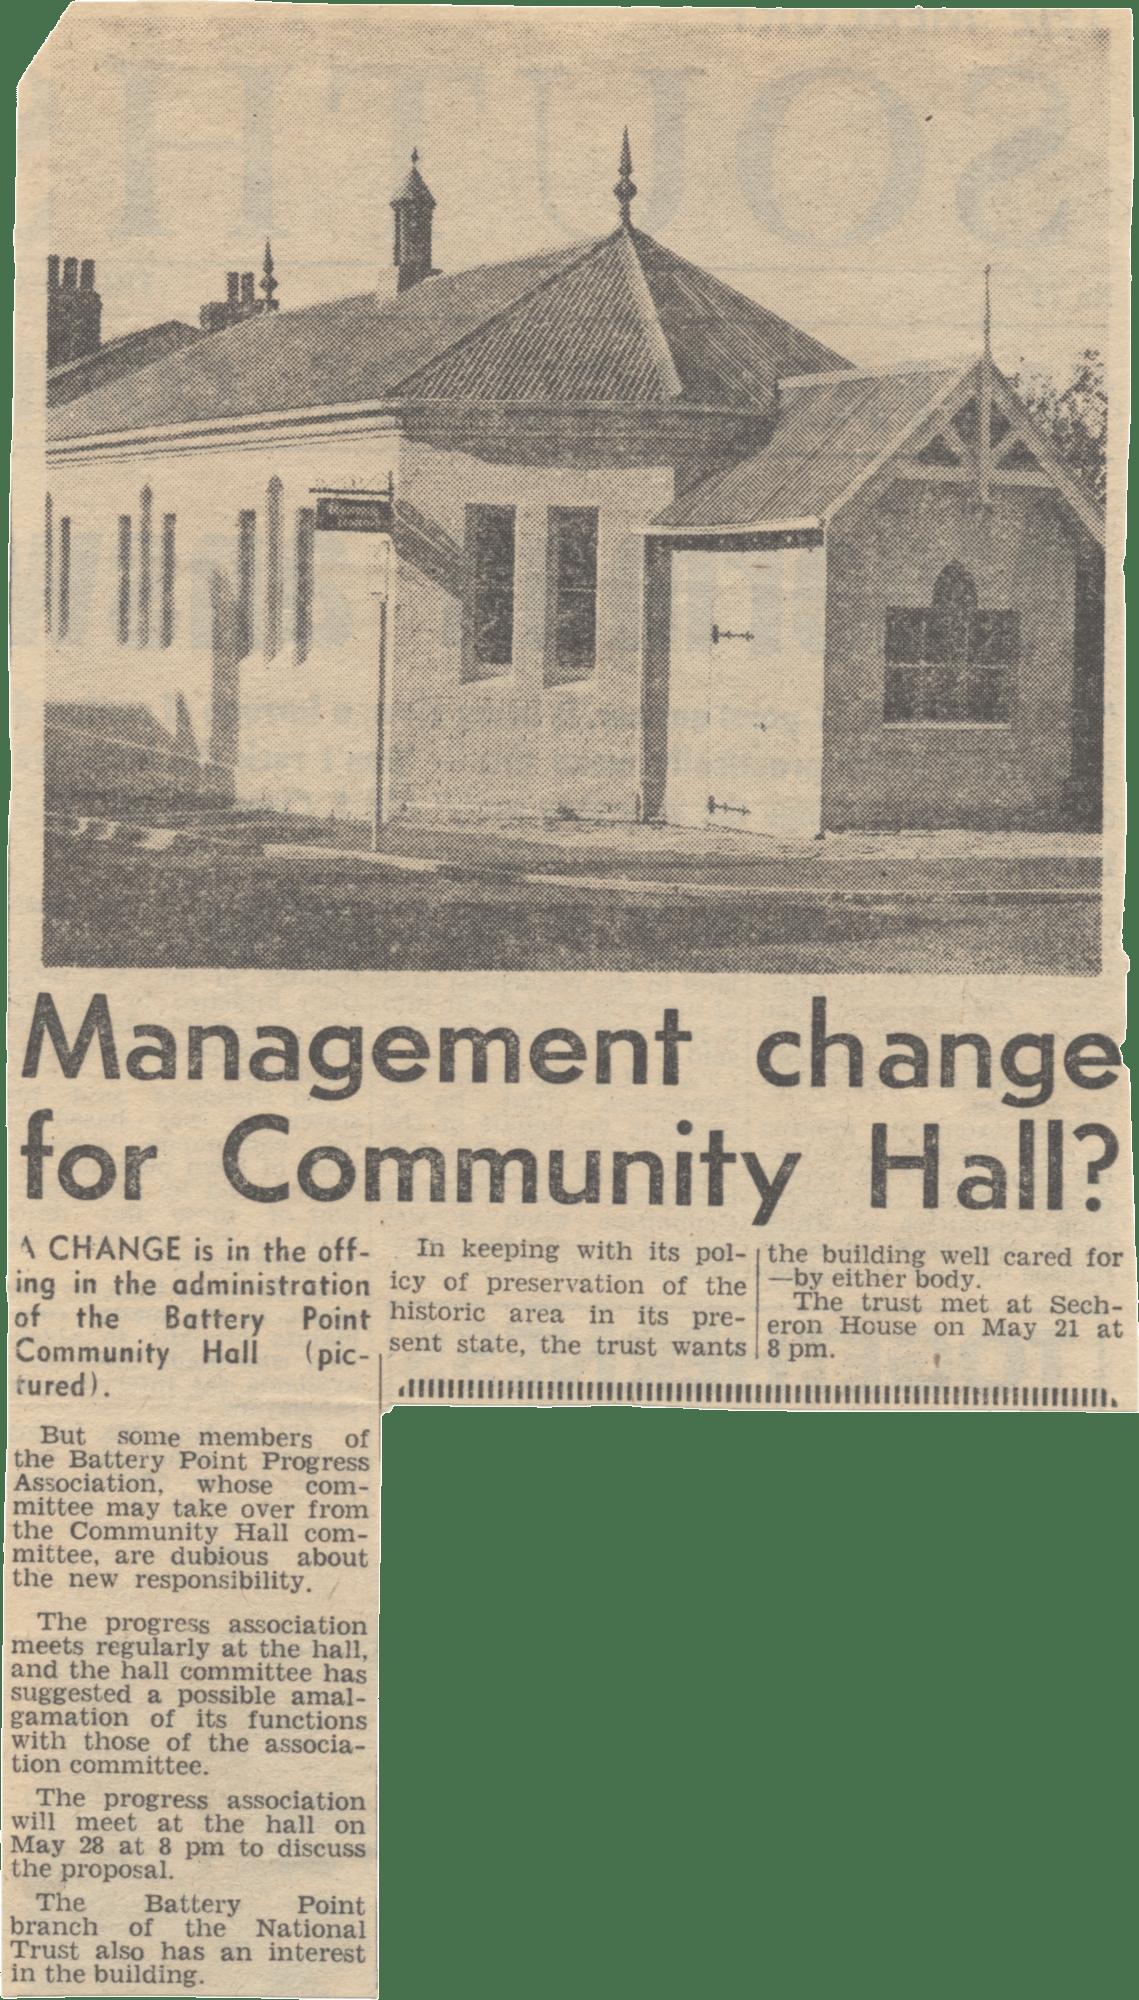 Management Change for Hall